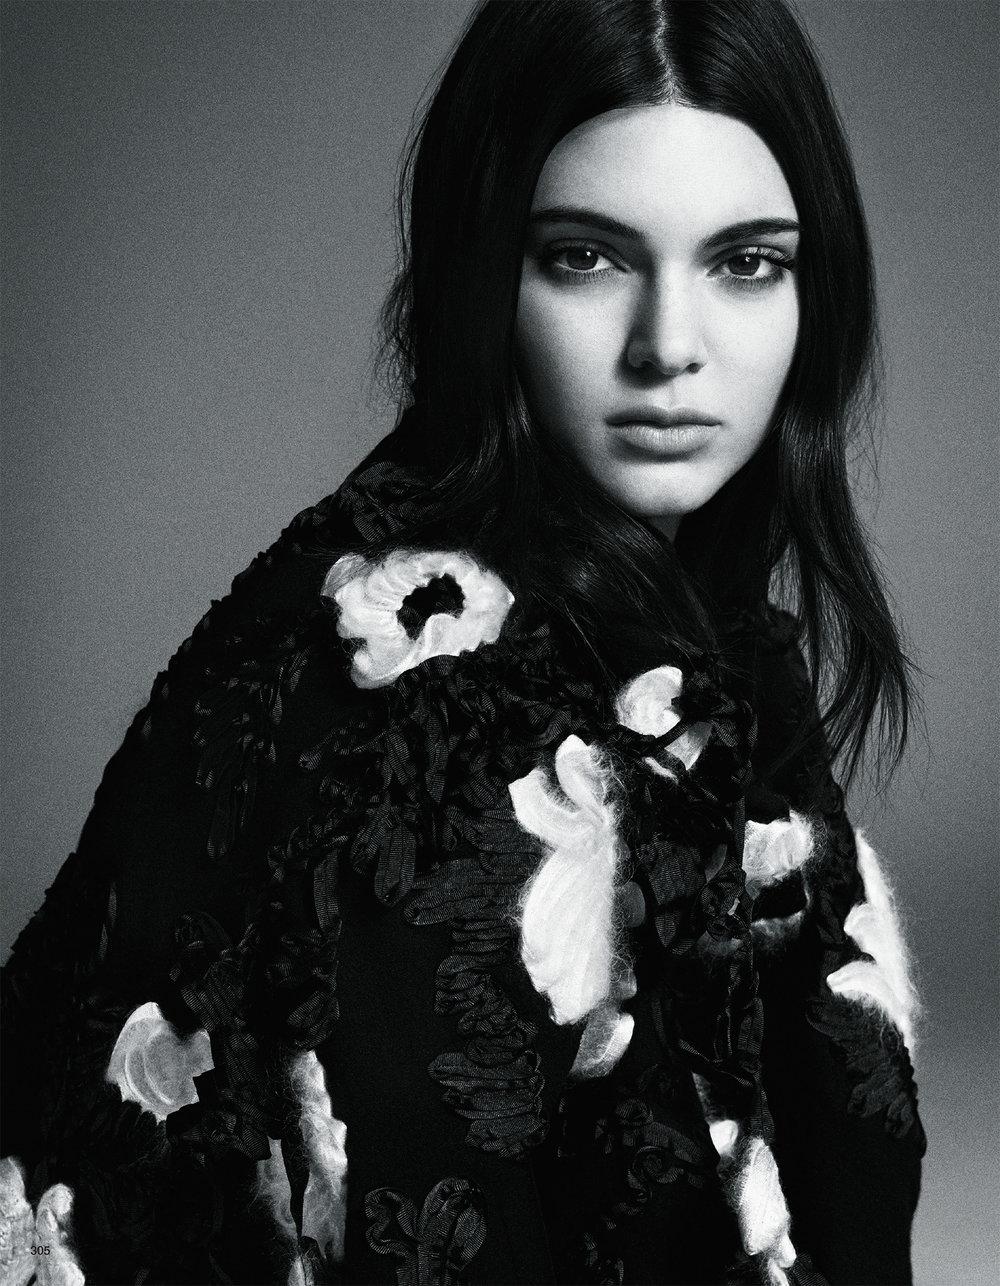 Giovanna-Battaglia-Vogue-Japan-November-2015-Cool-As-Kendall-Patrick-Demarchelier-Kendall-Jenner-2.jpg